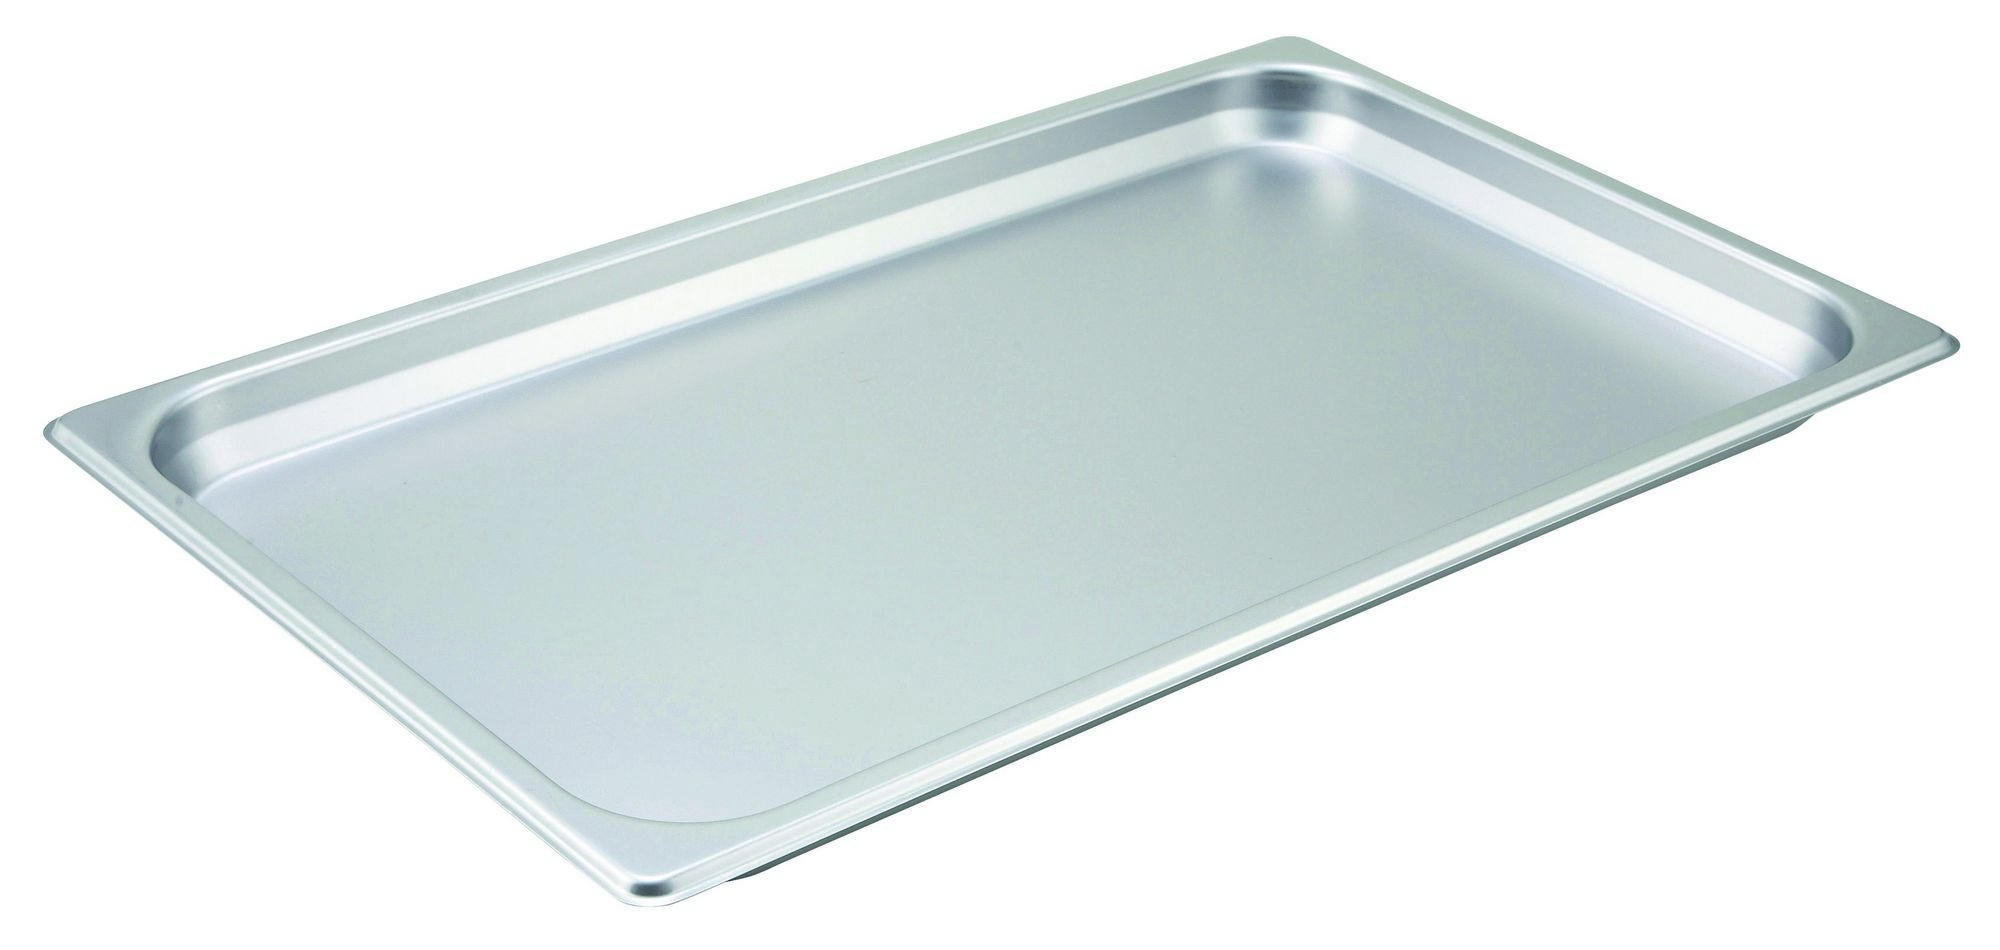 "Winco SPF1 Full Size 25 Gauge Steam Table Pan 1-1/4"" Deep"